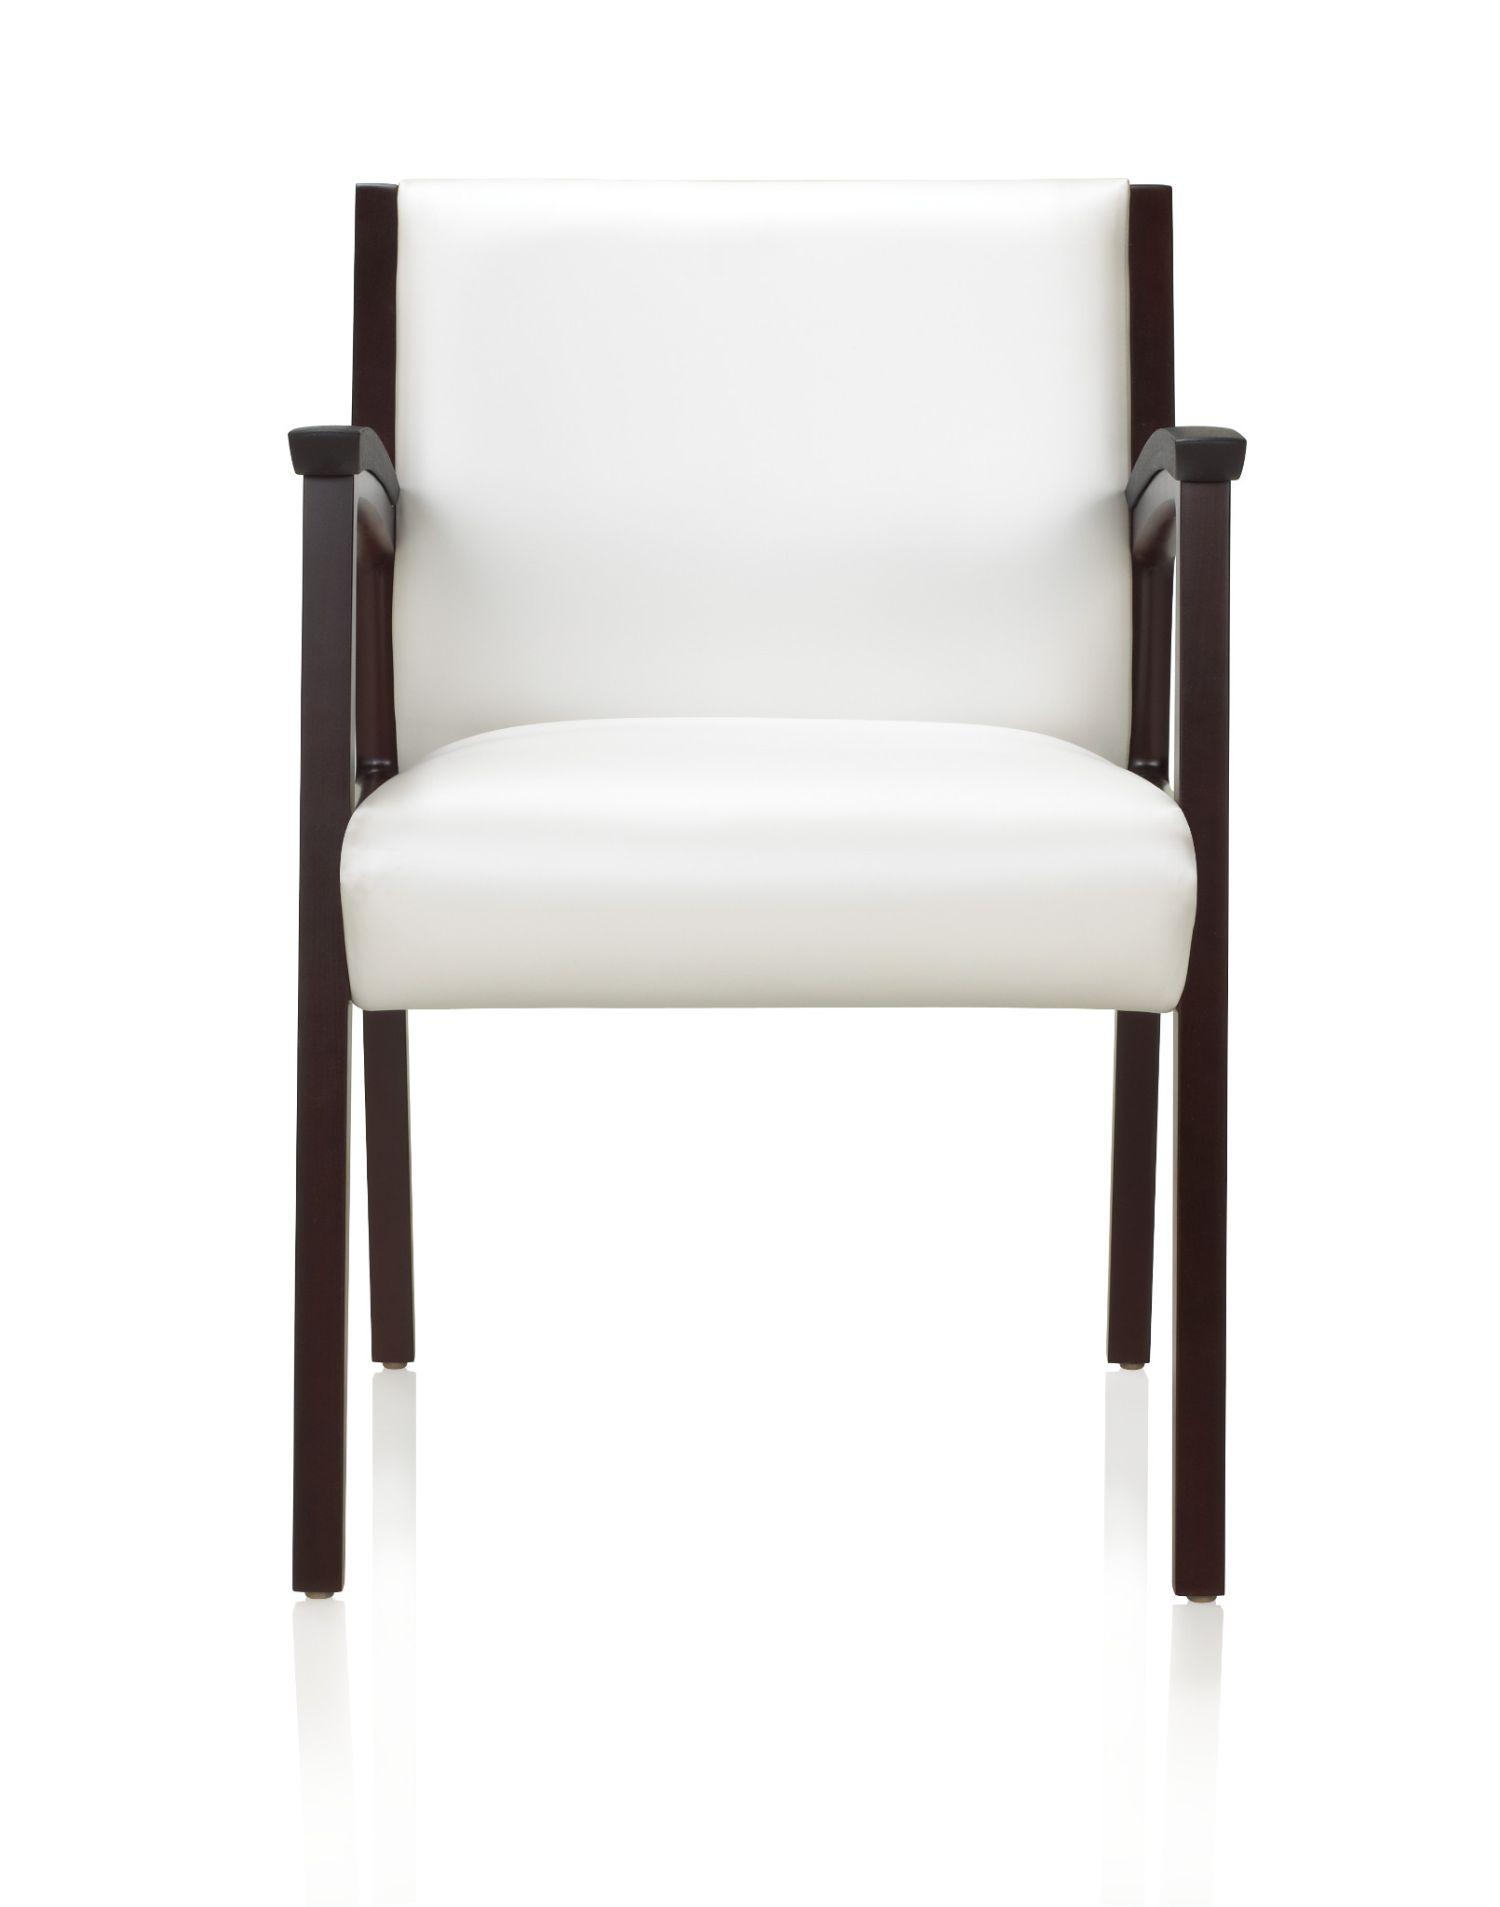 ki soltice guest chair front profile